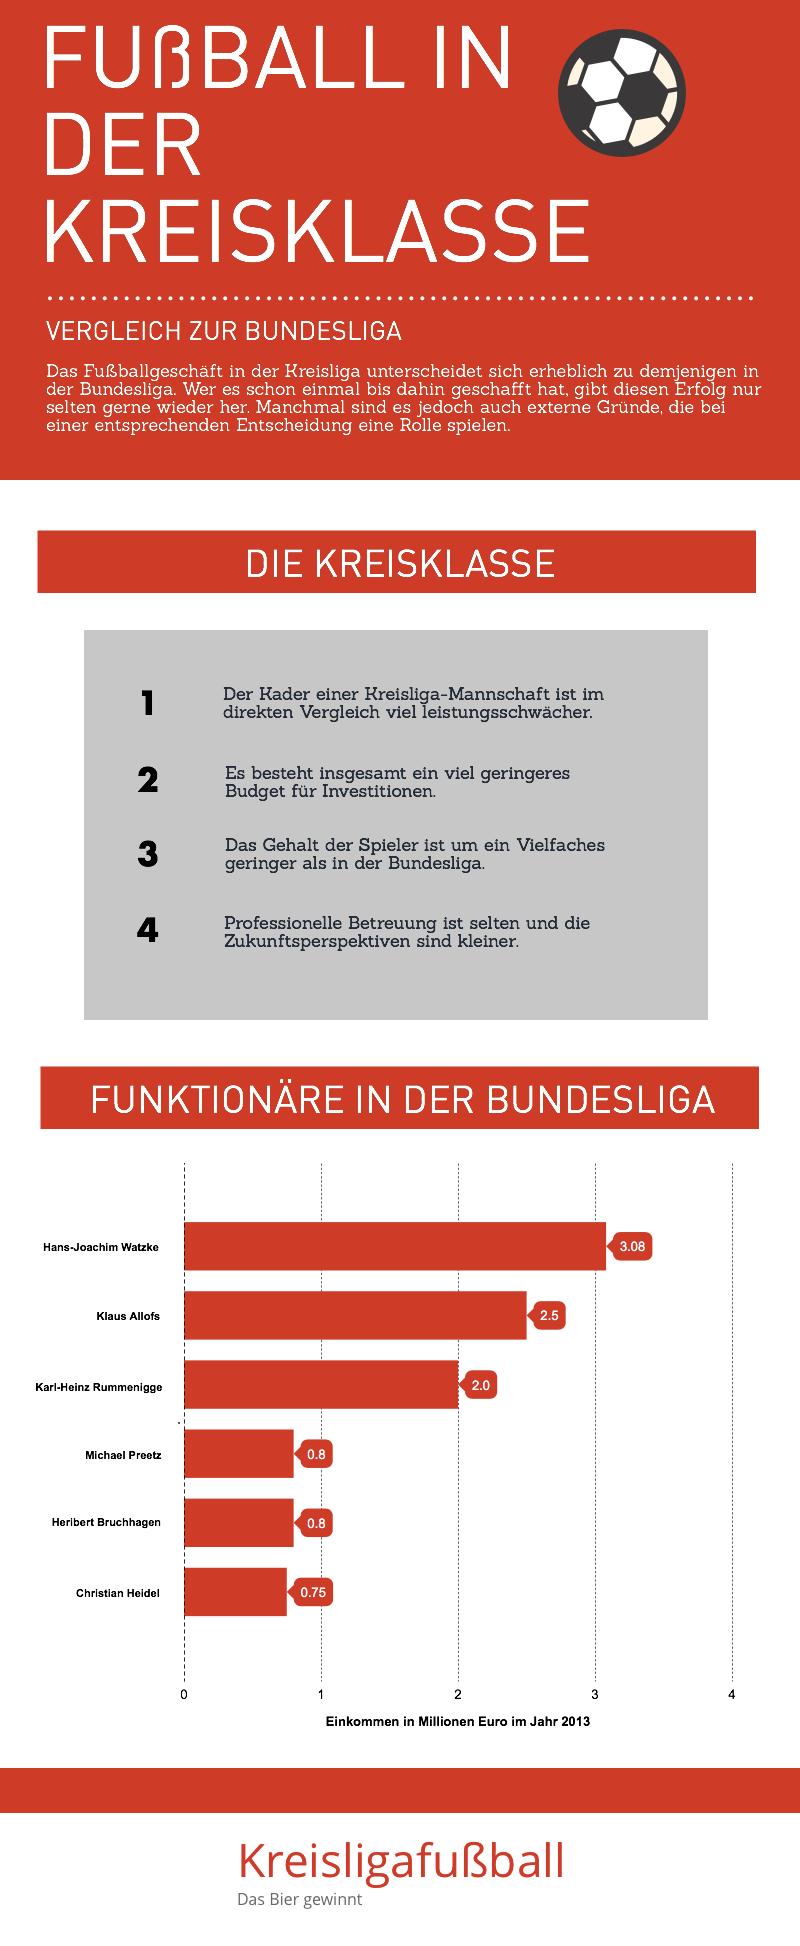 Infografik über den Fußball in der Kreisklasse